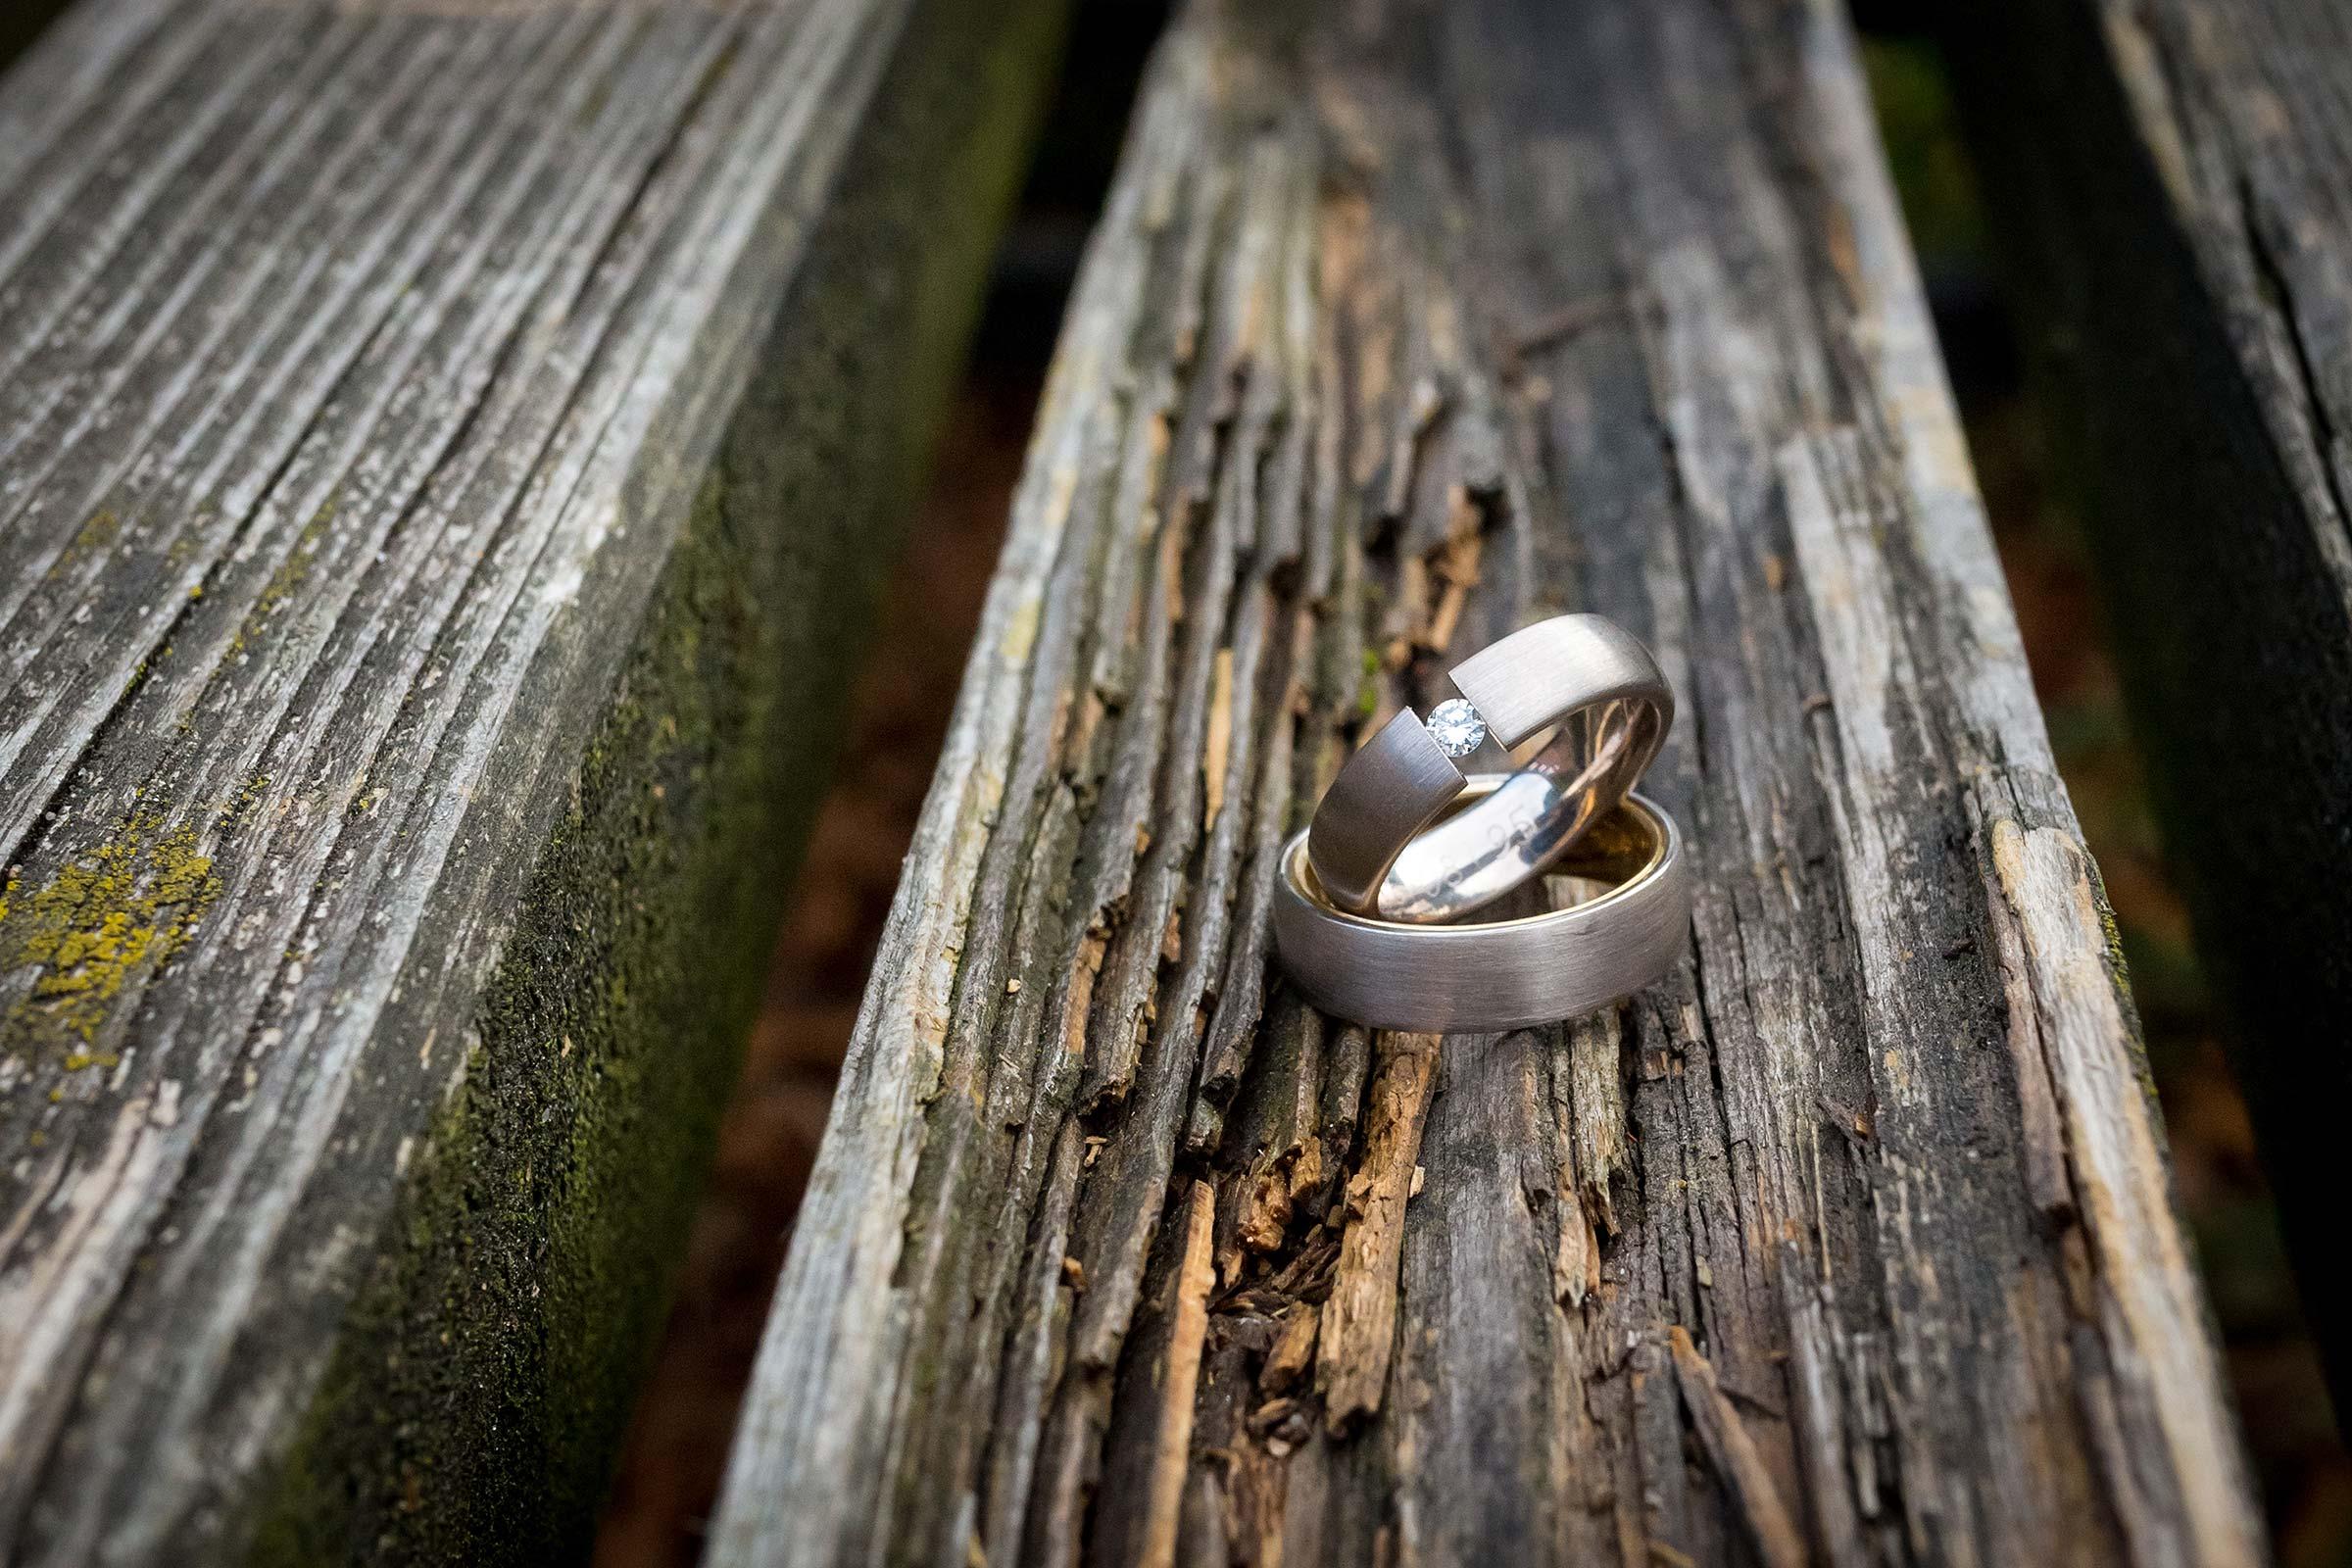 Hochzeitsringe auf altem Holz